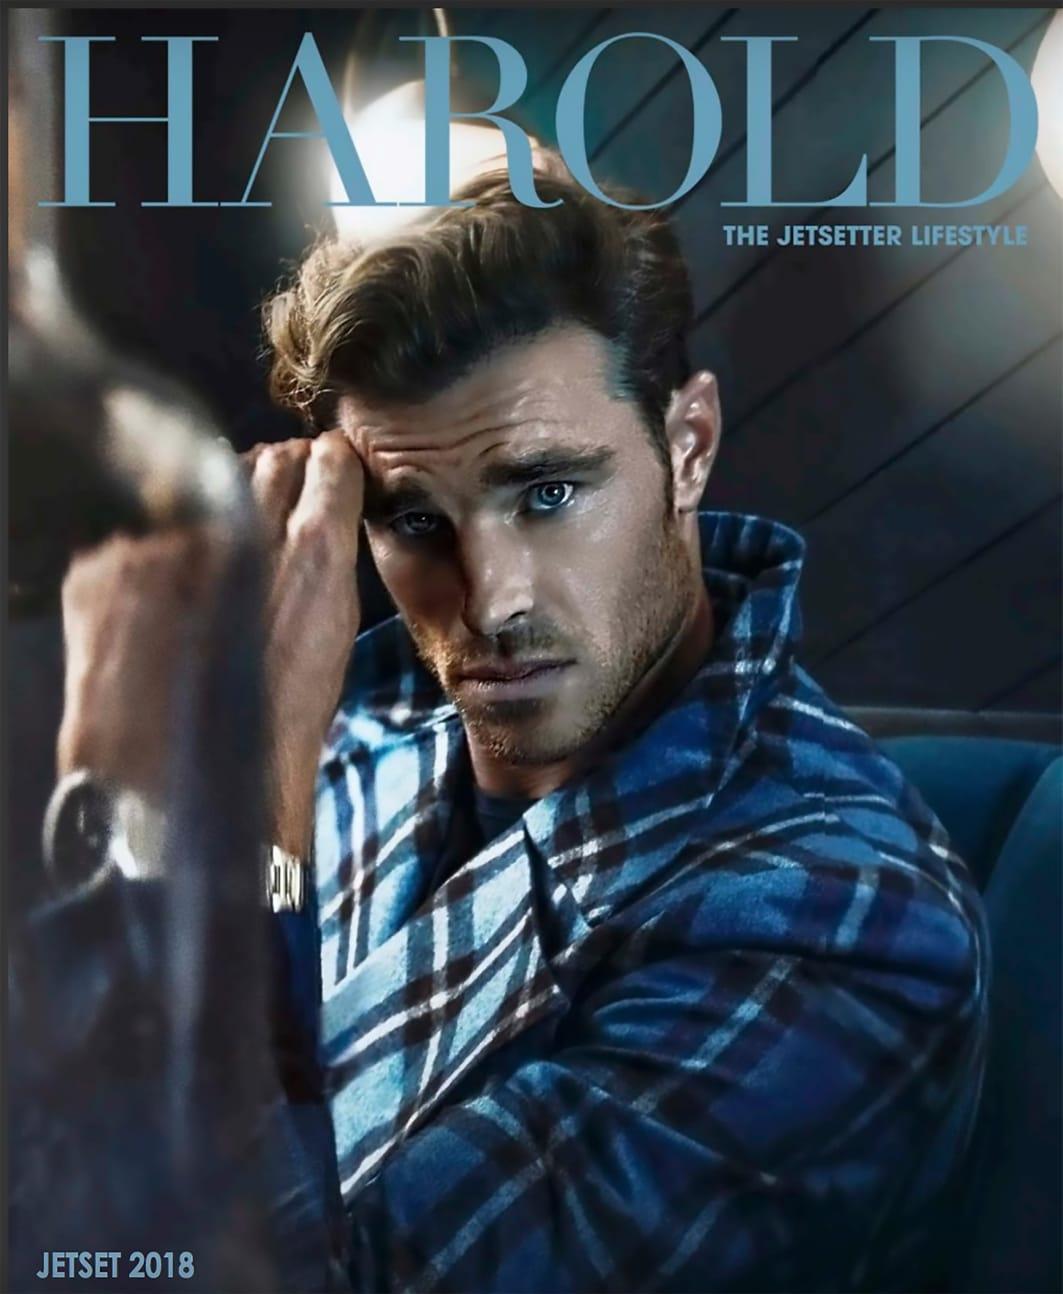 Harold Magazine - British actor David Frampton